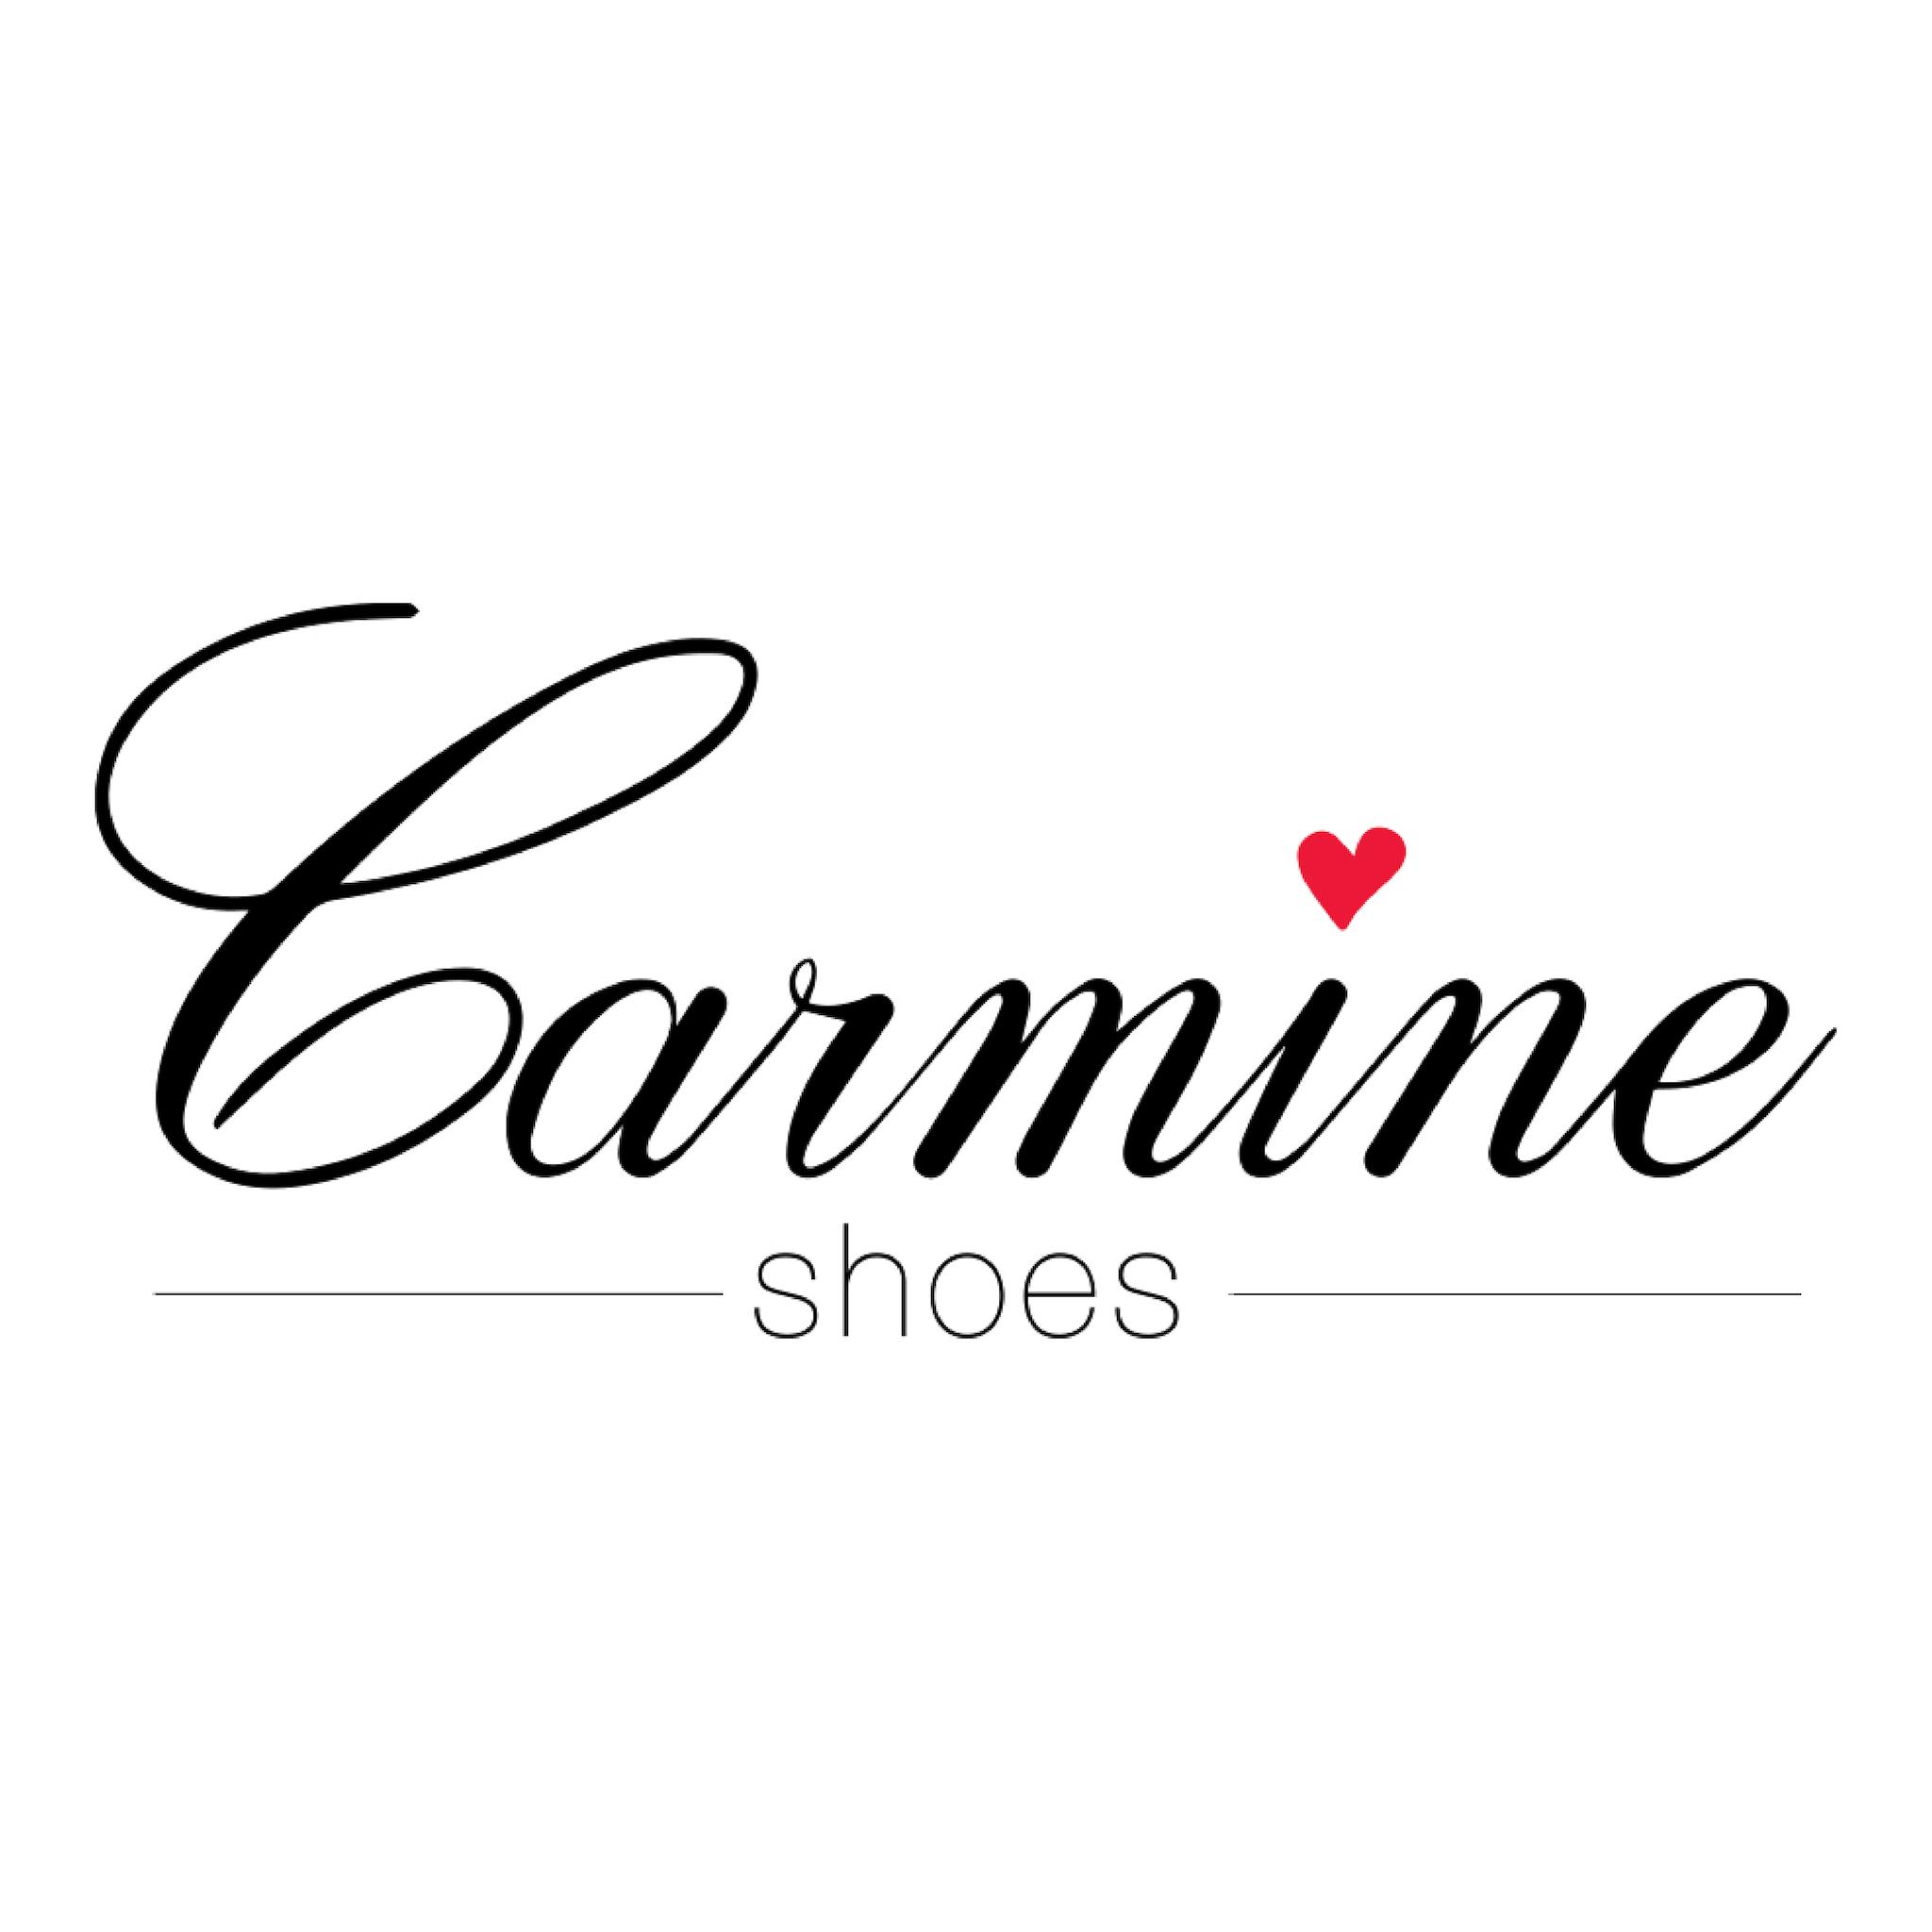 Carmine Shoes